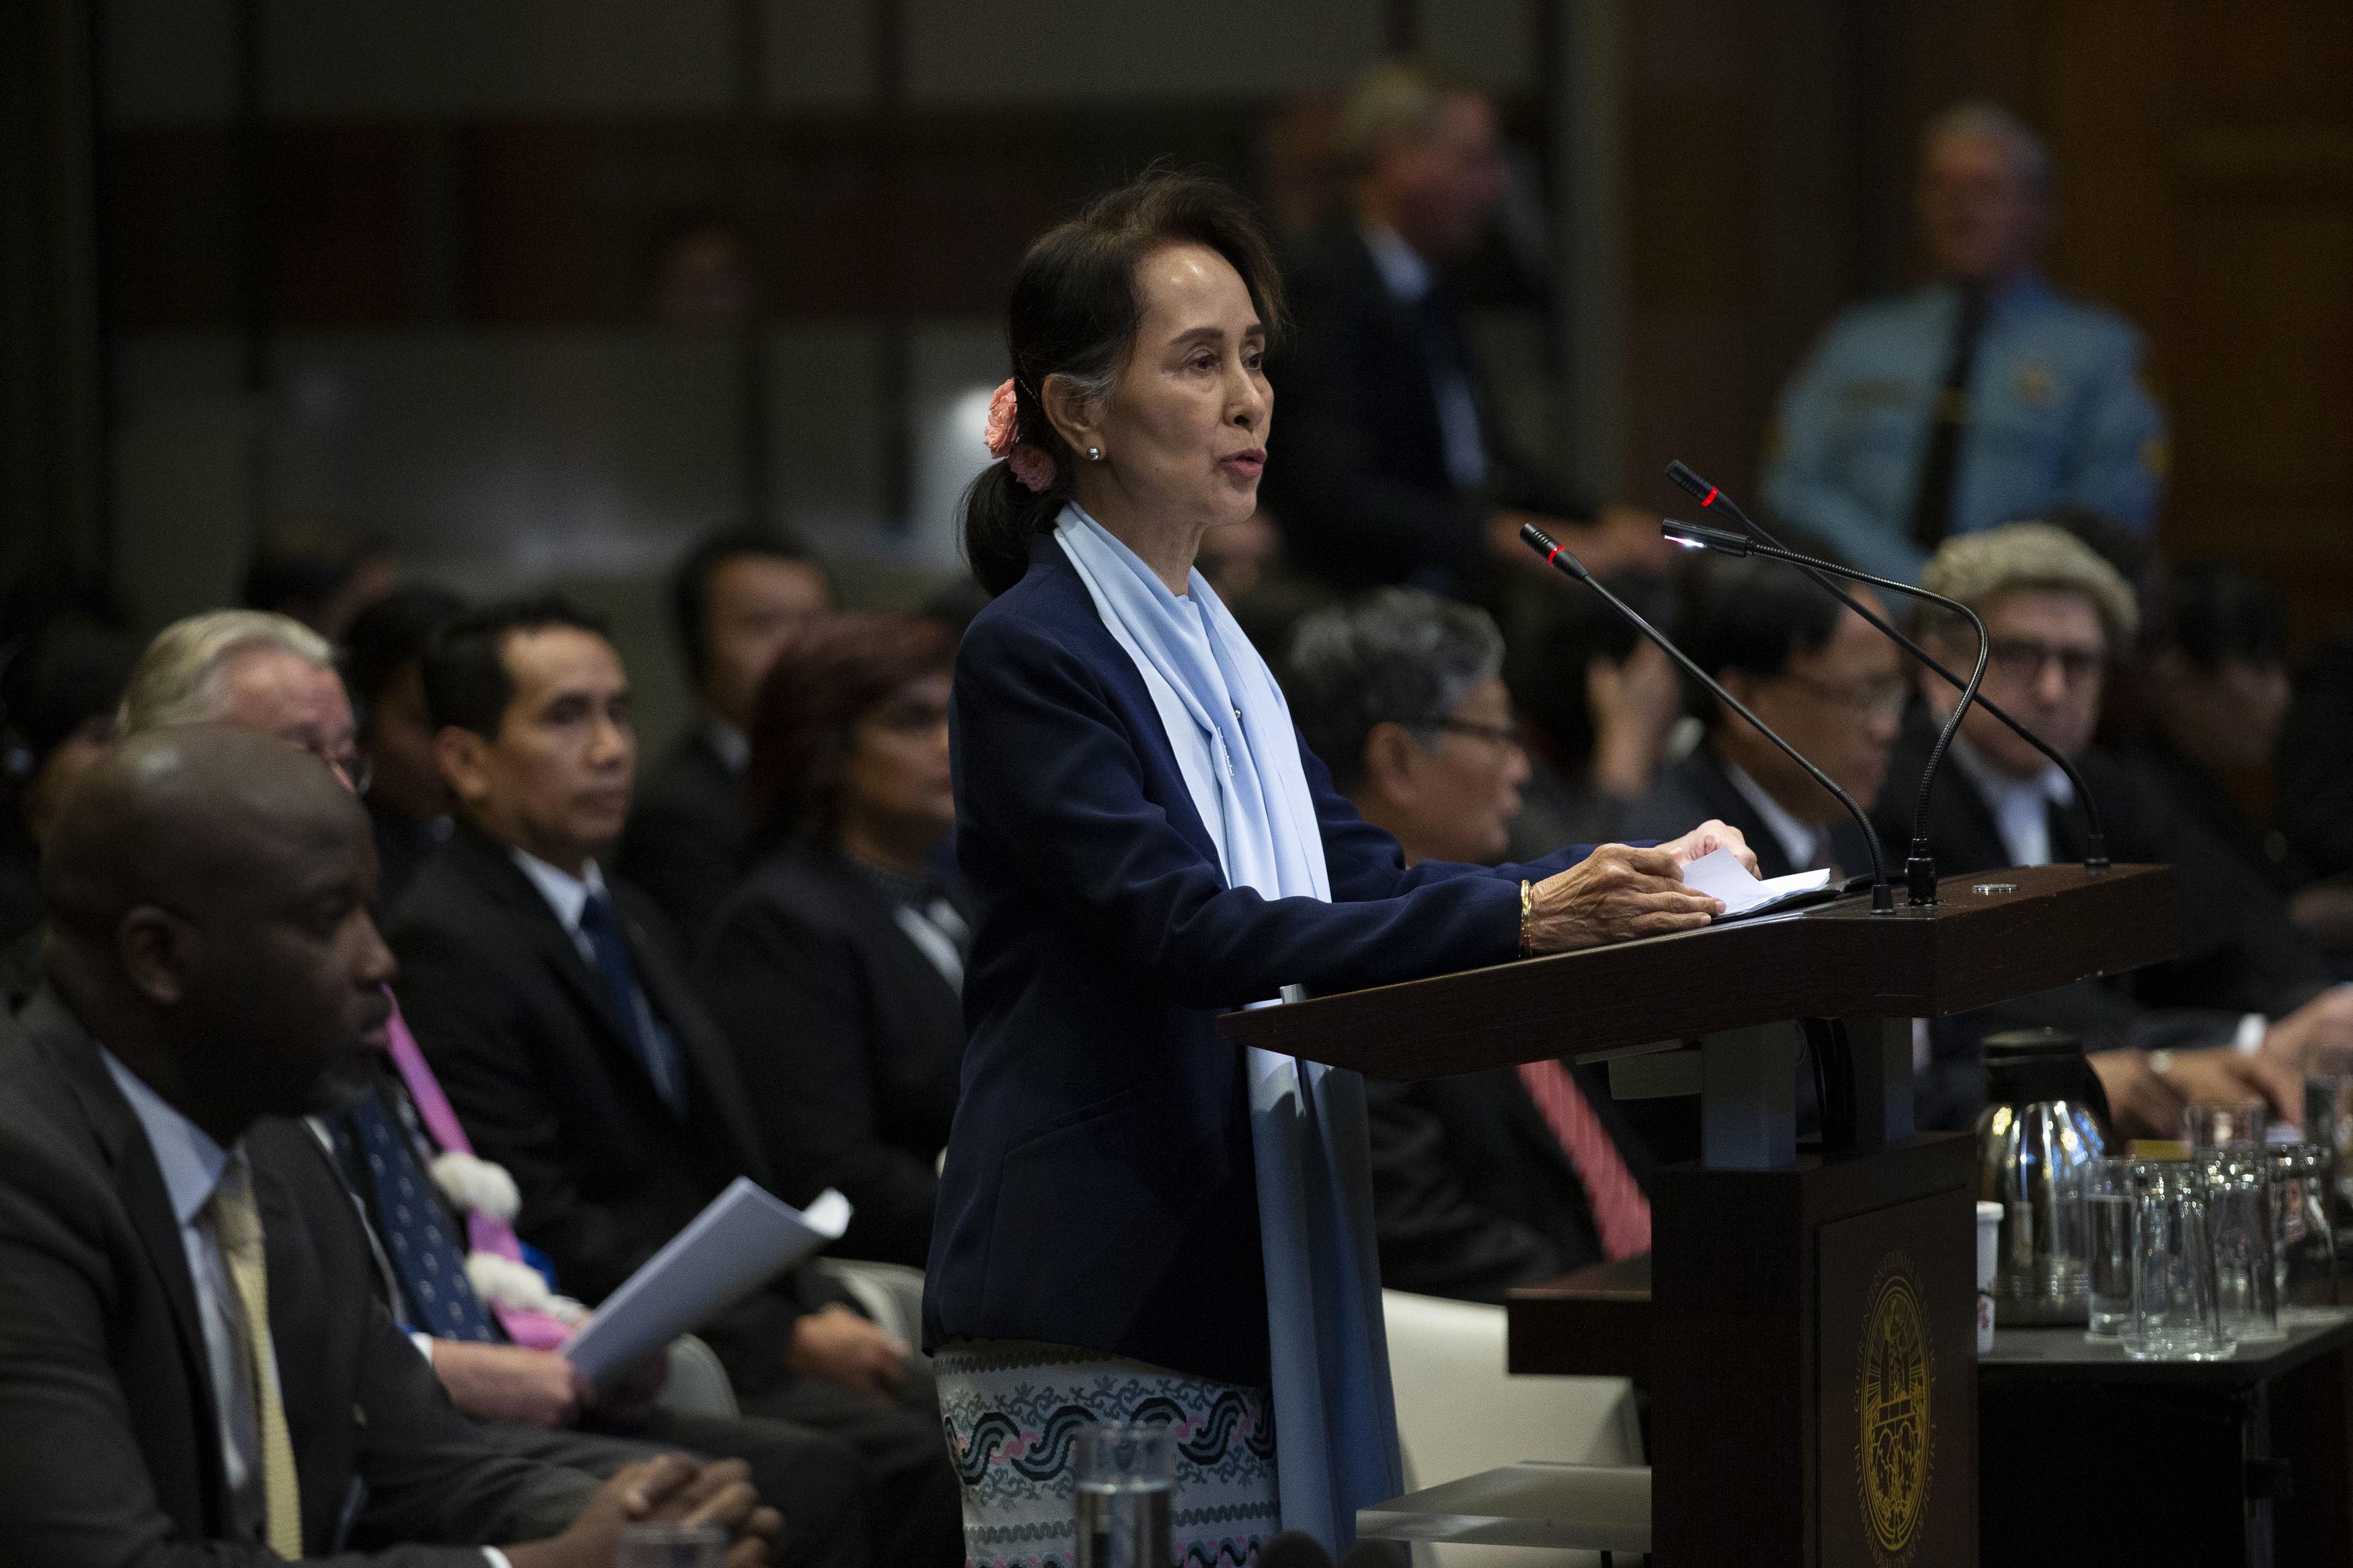 Aung San Suu Kyi in The Hague last week